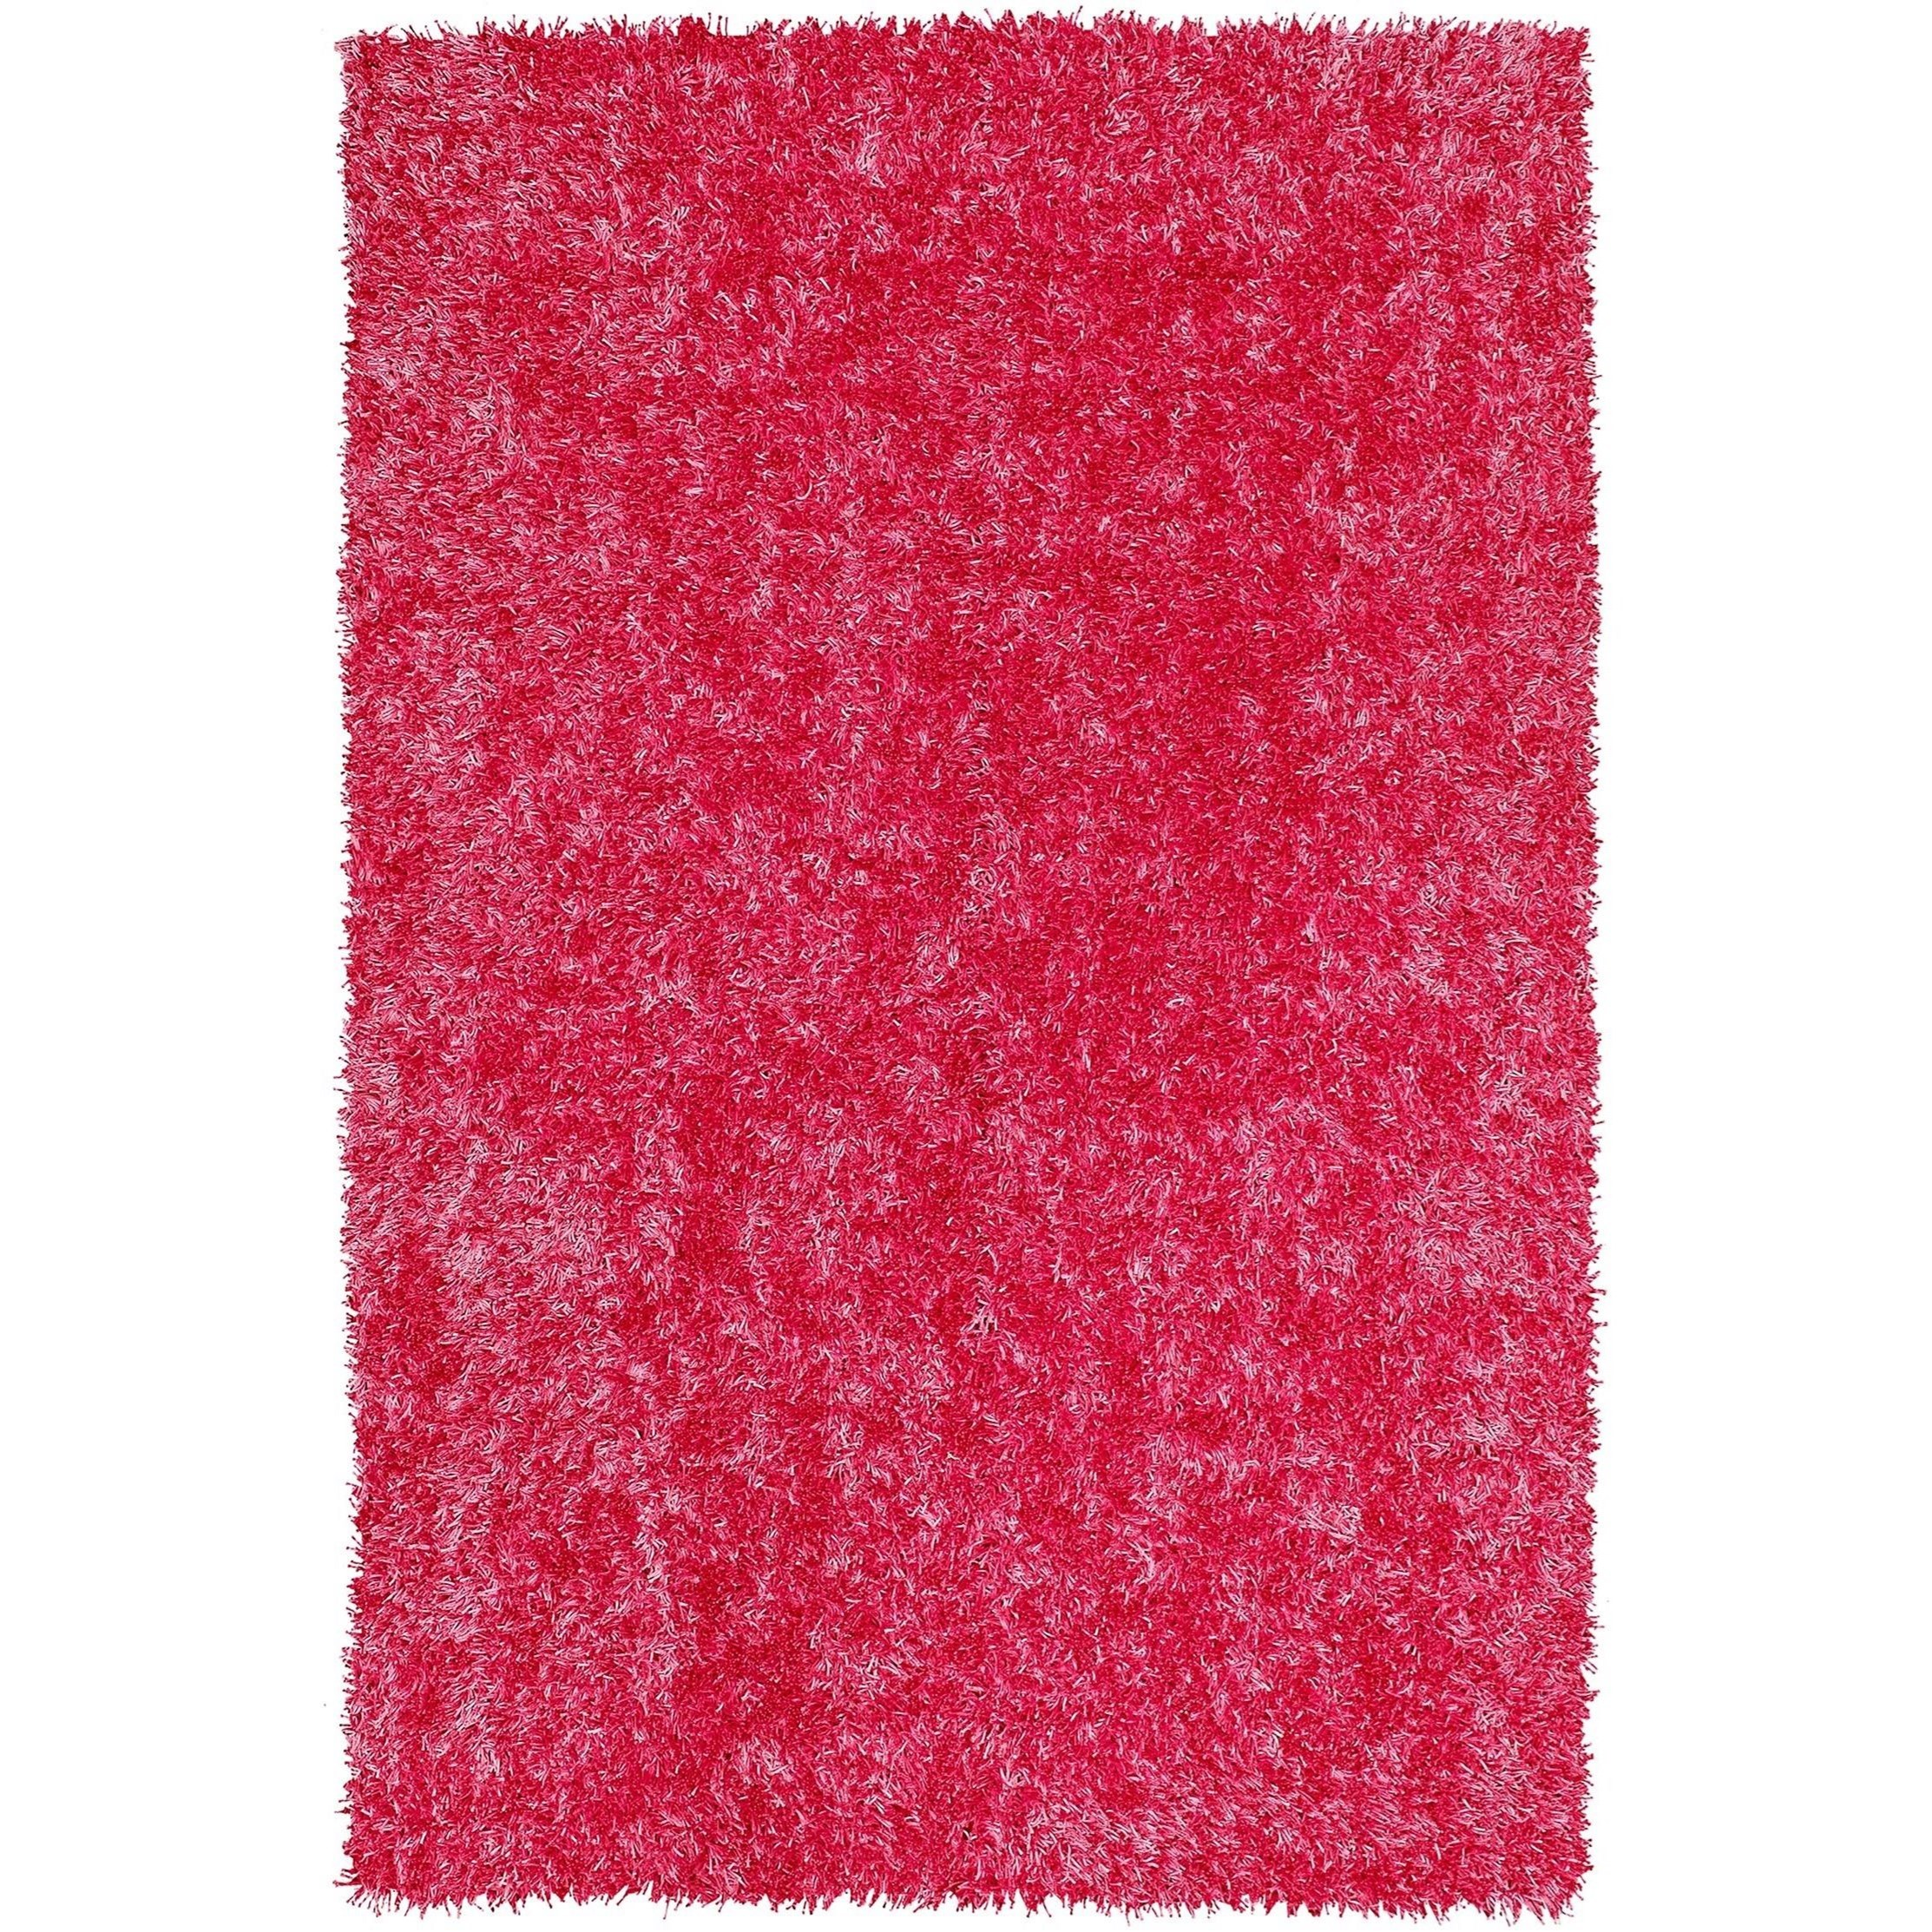 "Dalyn Bright Lights Hot Pink 5'X7'6"" Rug - Item Number: BG69HP5X8"